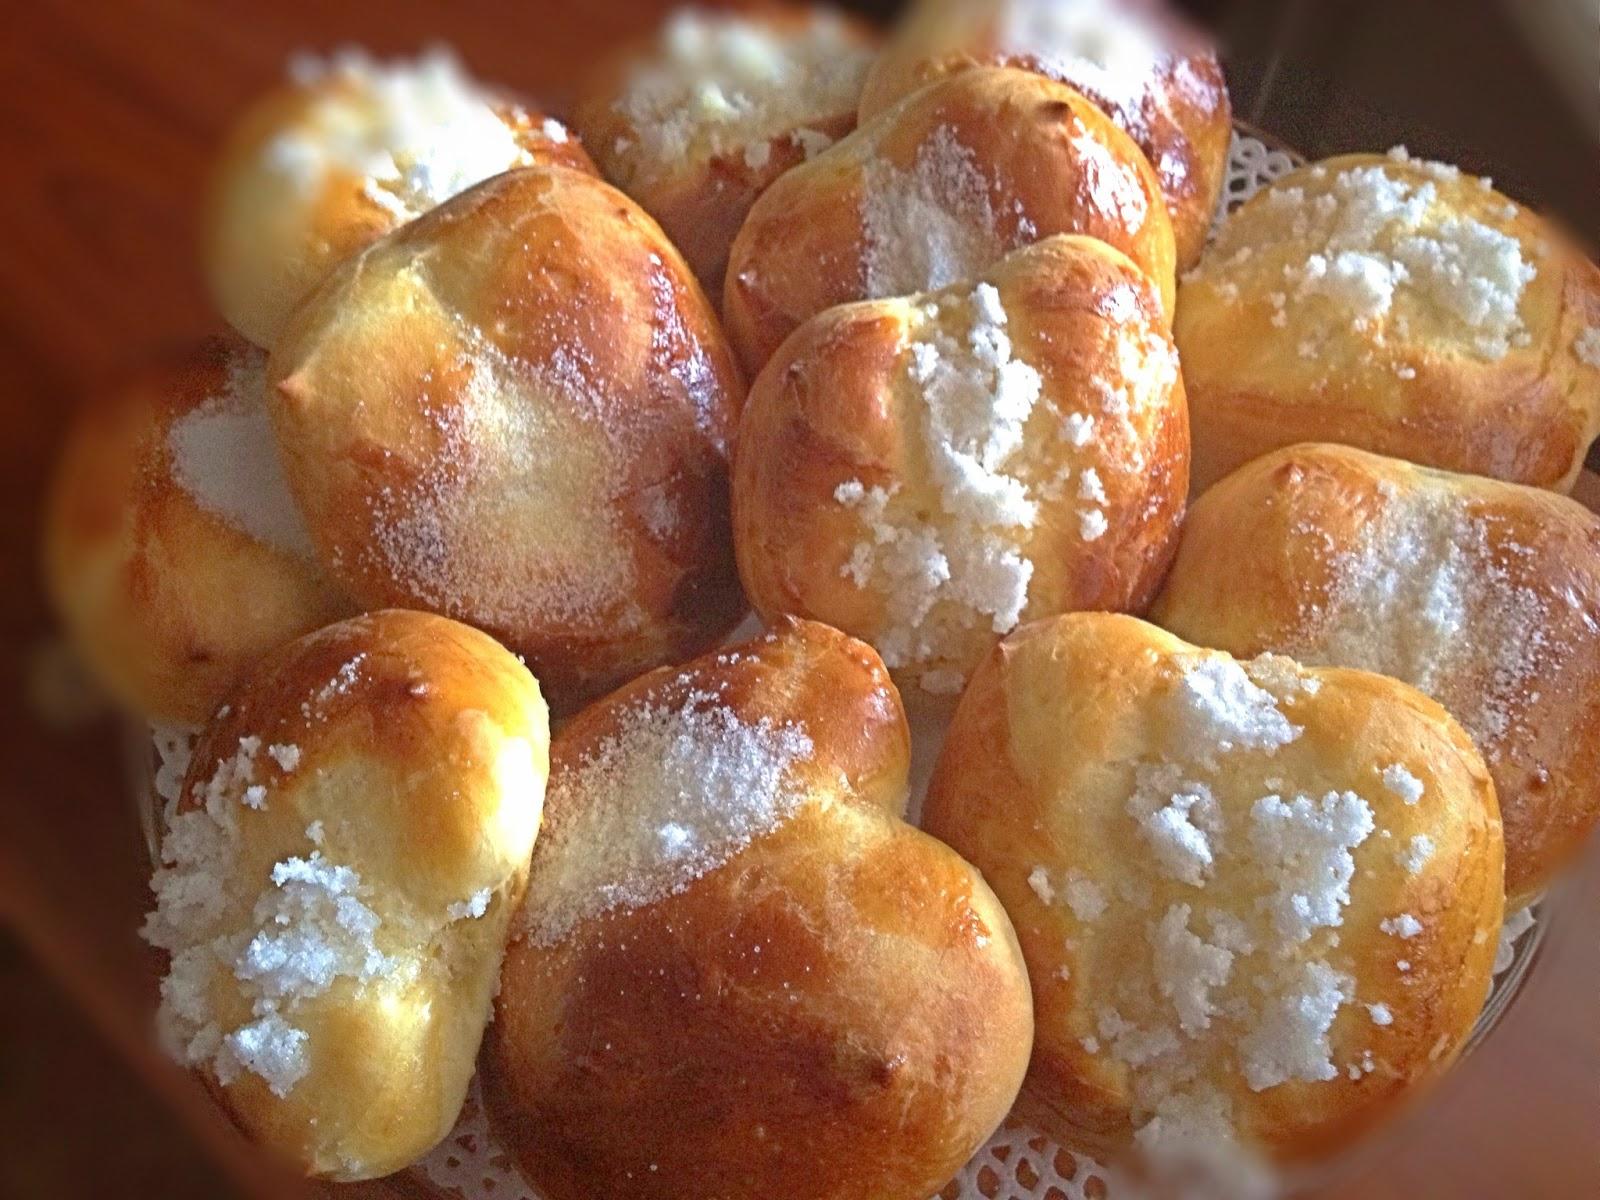 bollos-suizos-receta-tradicional-3